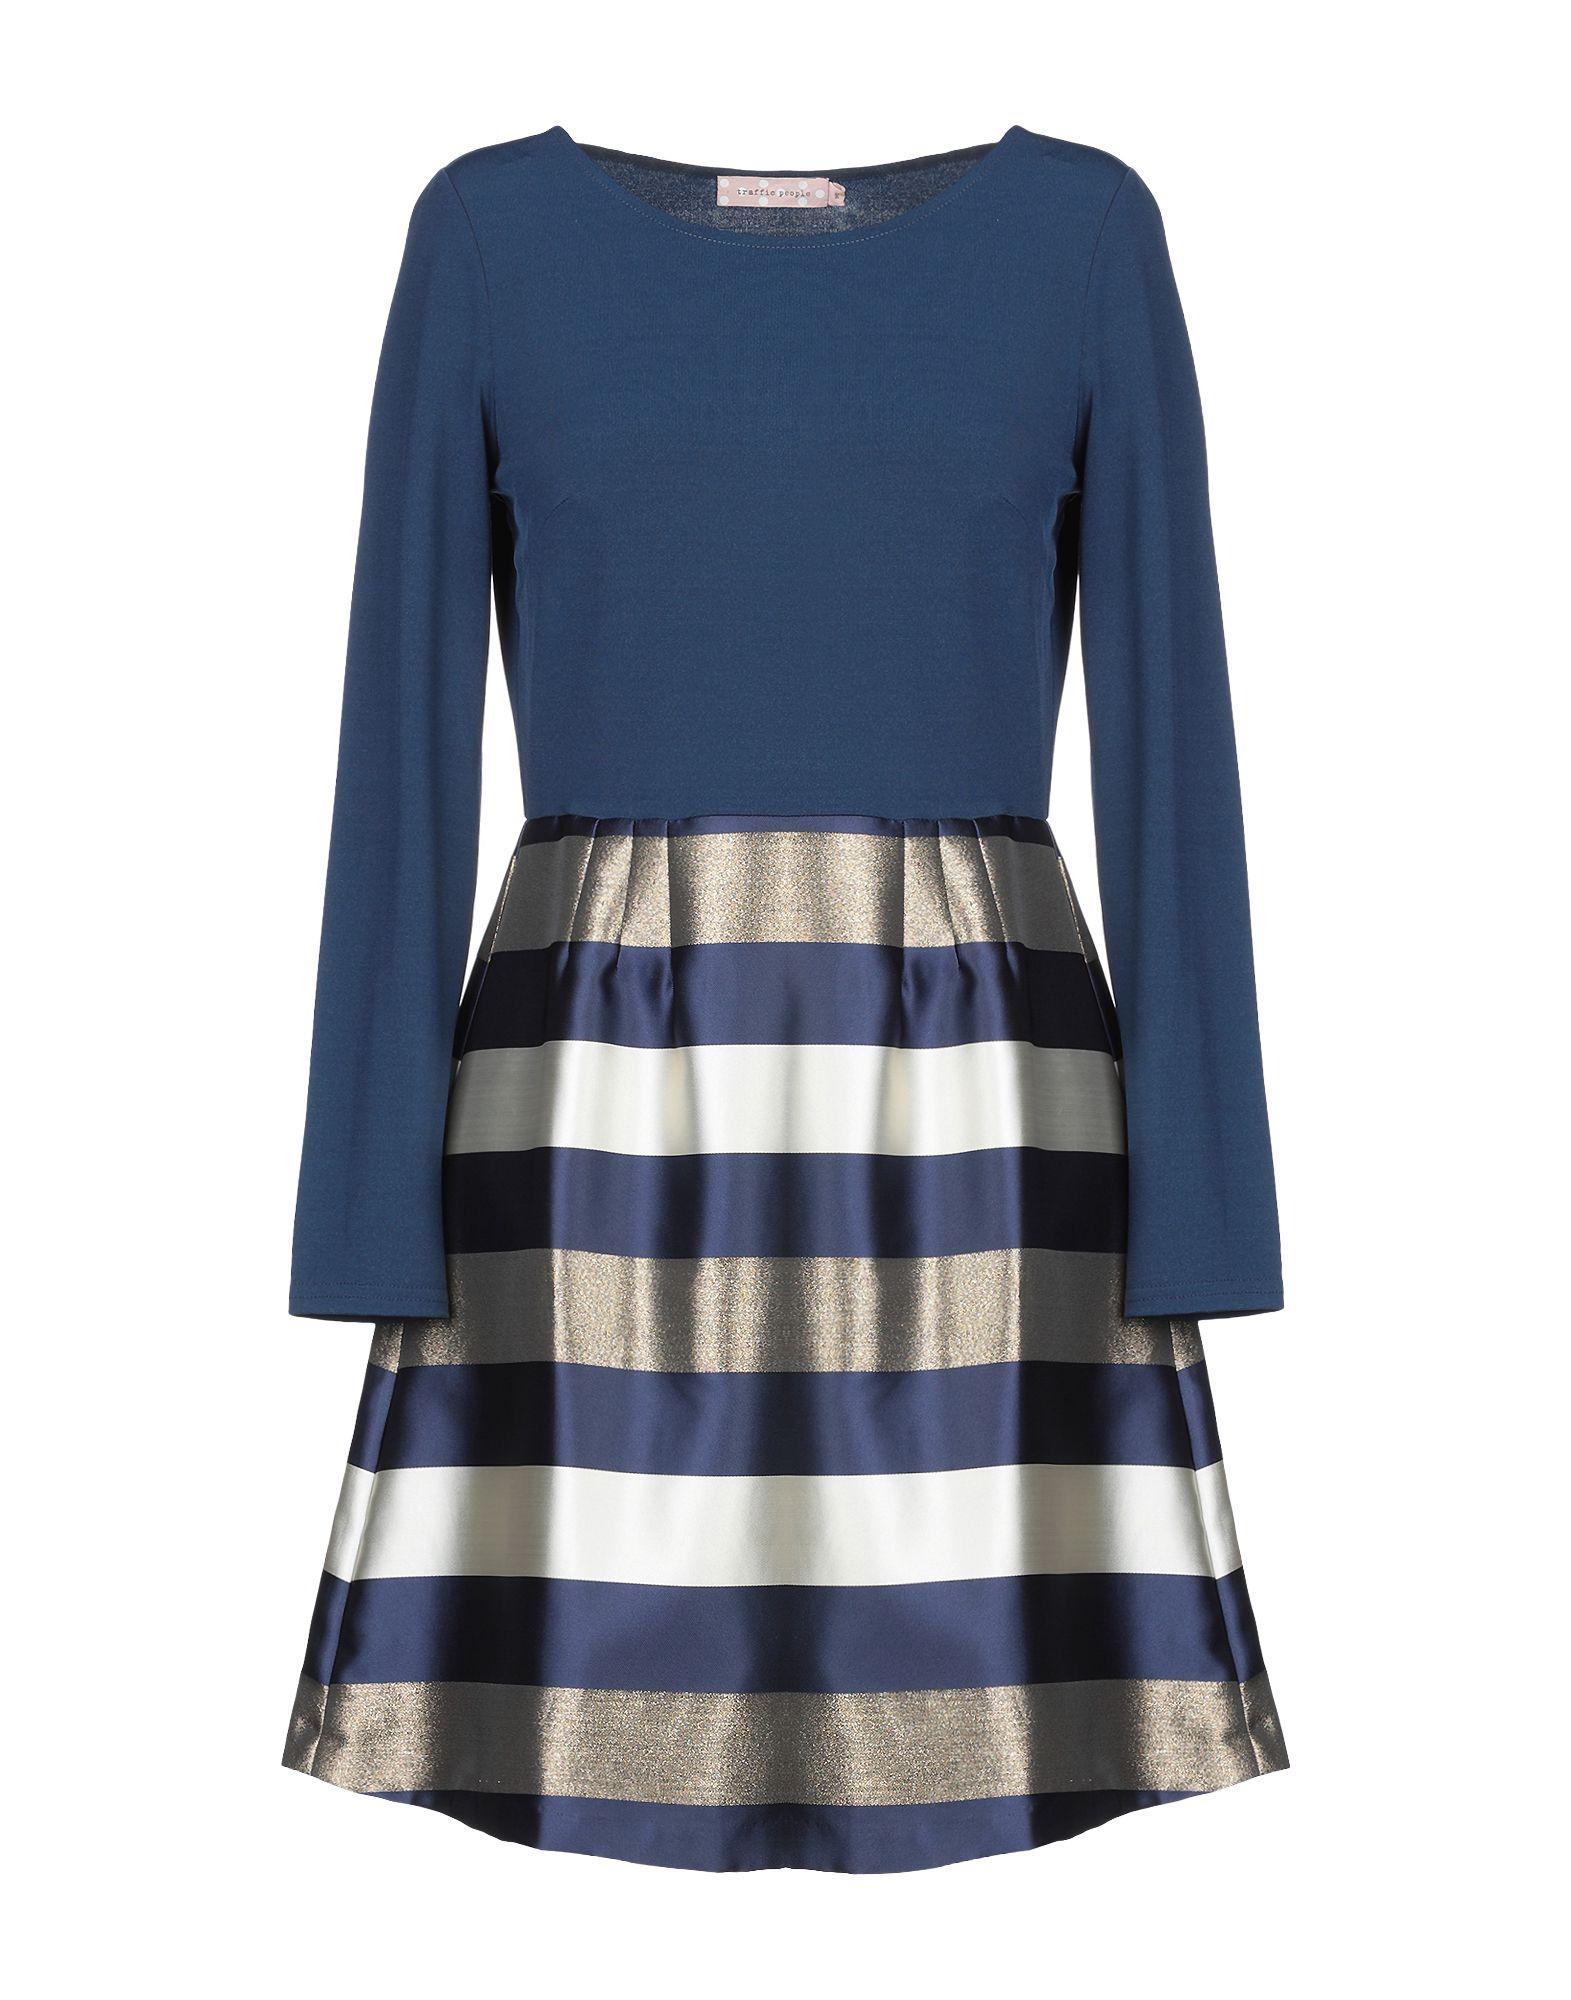 bd0fca5214b5 TRAFFIC PEOPLE - Γυναικεία Φορέματα